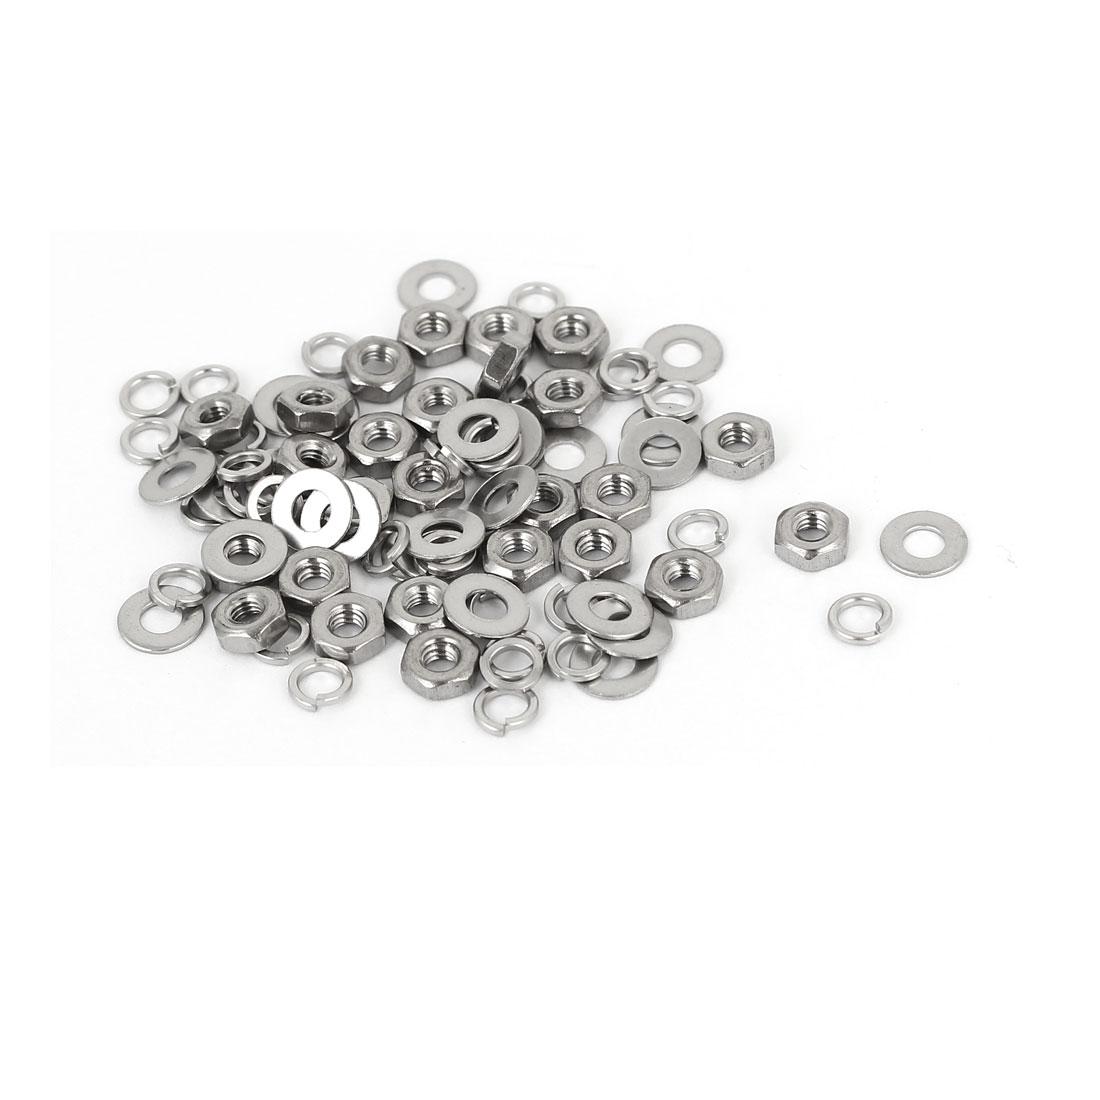 M2 Thread Diameter 304 Stainless Steel Hex Nut Flat Washer Split Lock 25 Sets